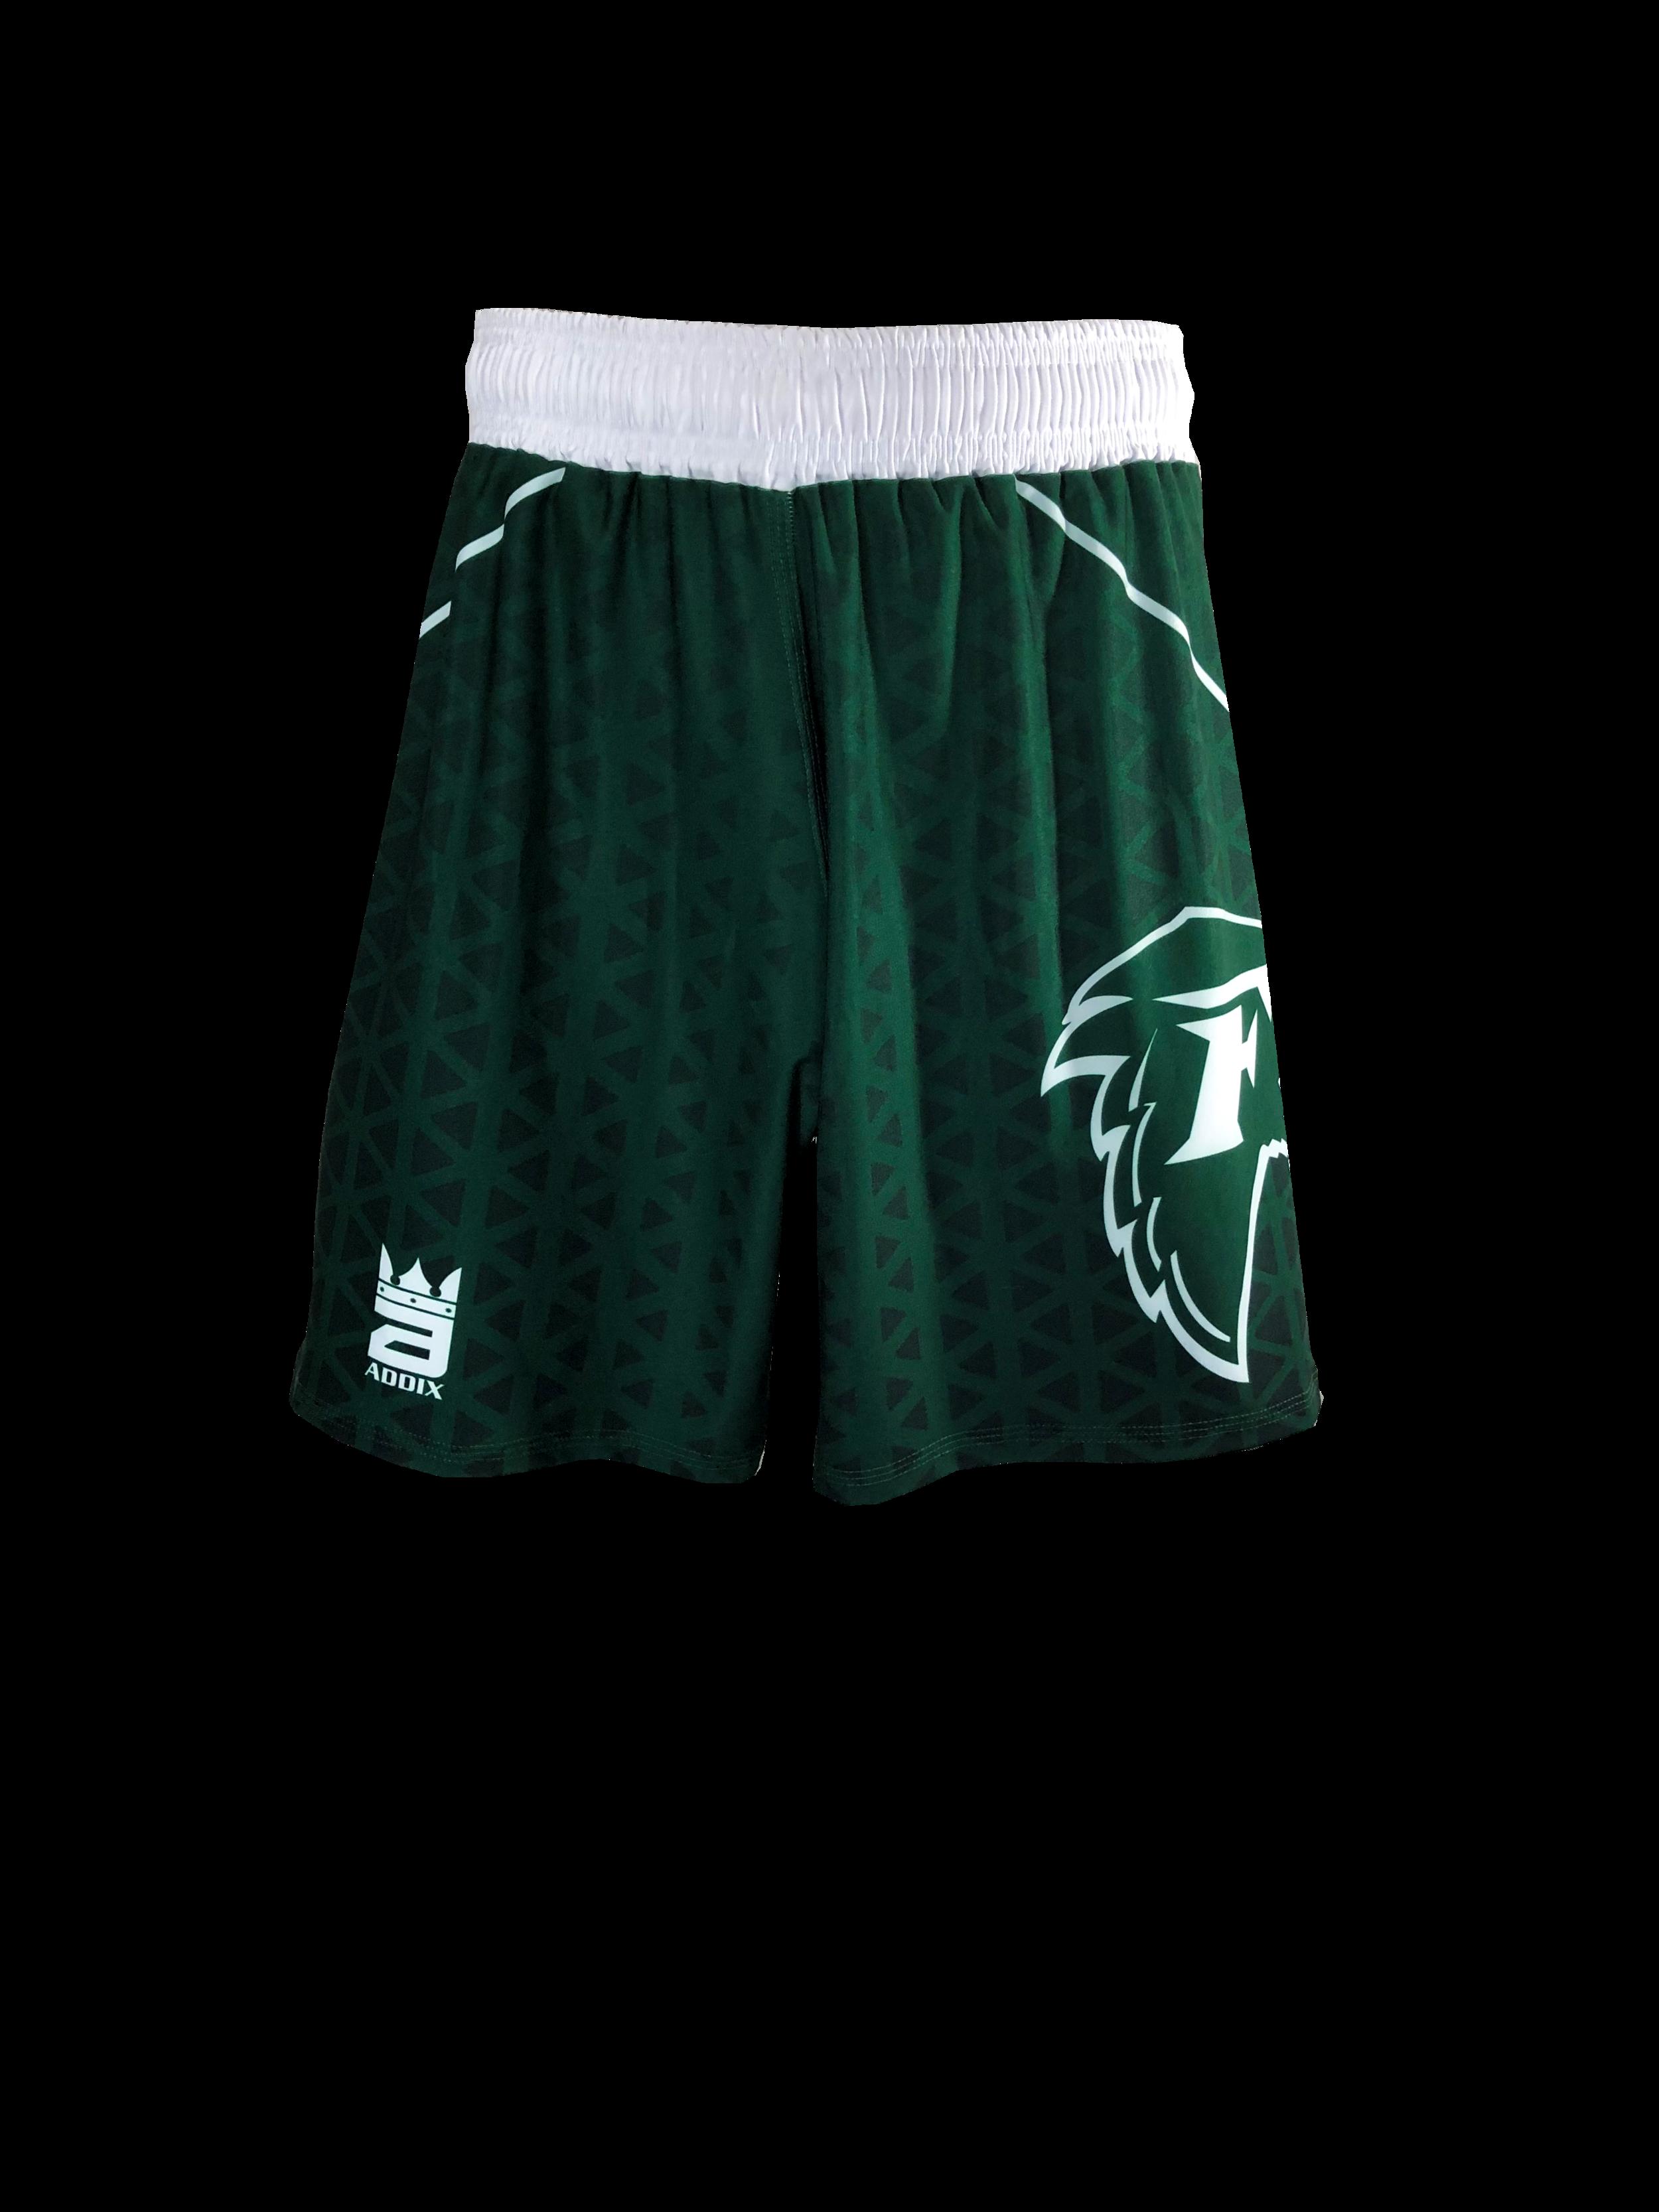 Freeland Custom Soccer Shorts